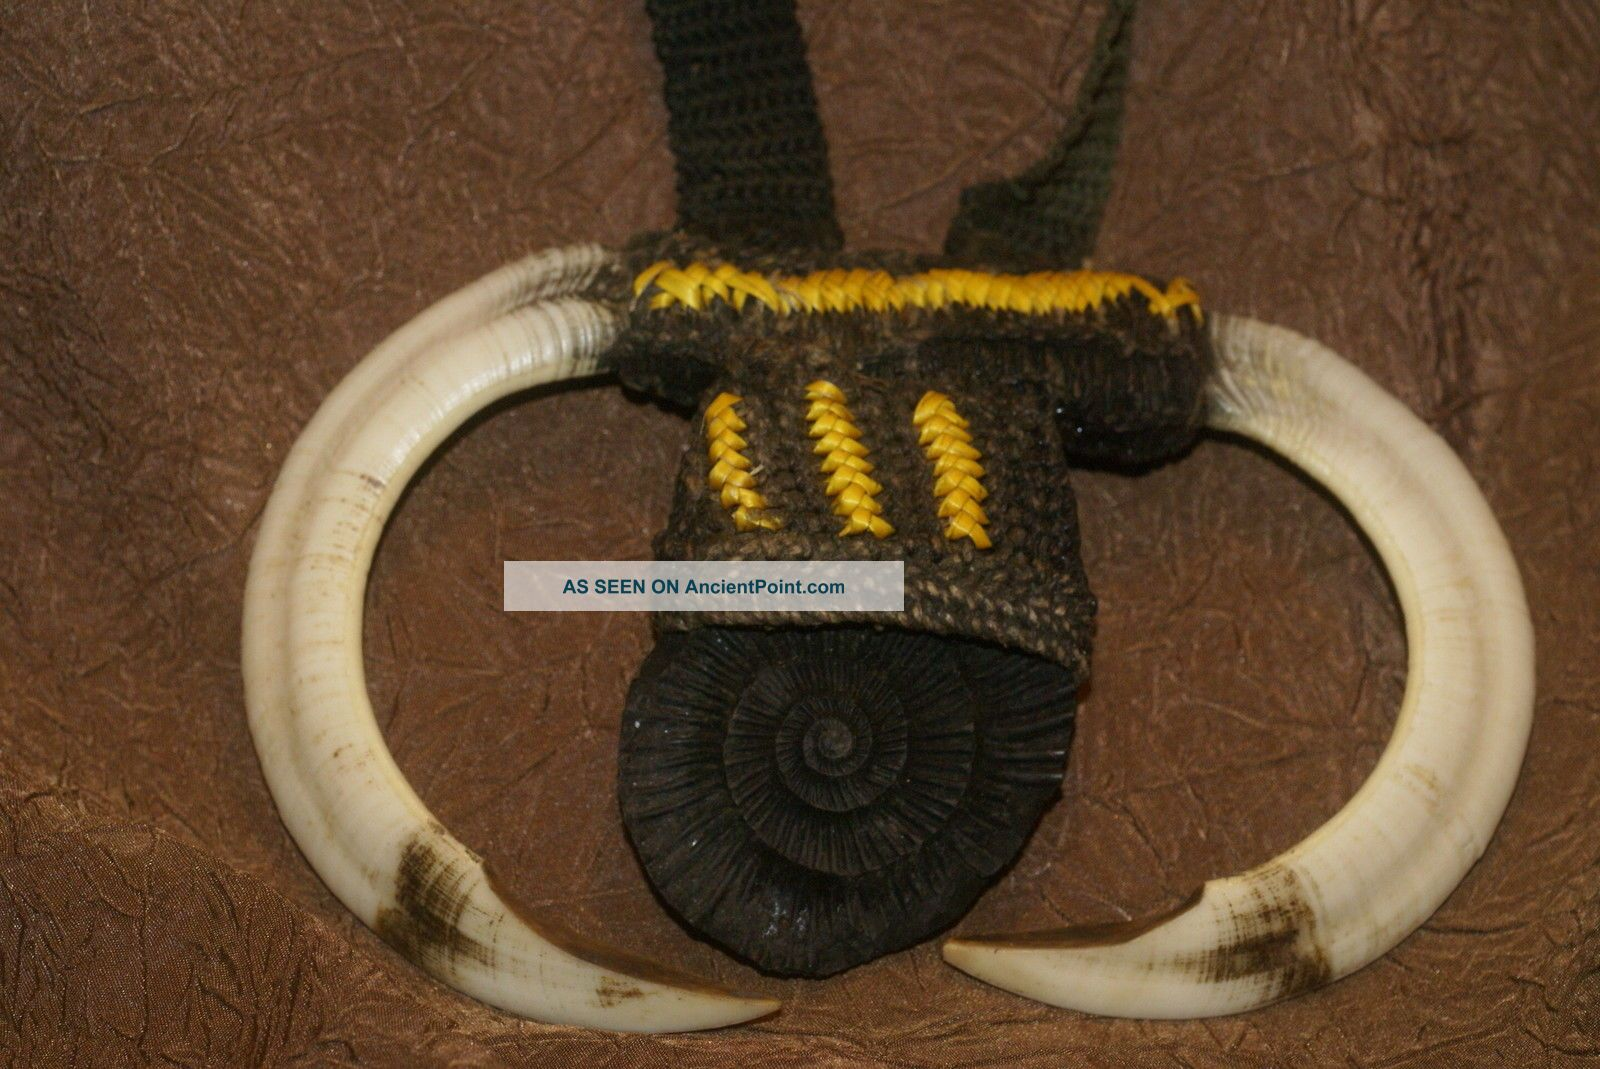 Big Man Chief Tribal Rare Ammonite Boar Trophy Bride Price Pectoral Guinea Pacific Islands & Oceania photo